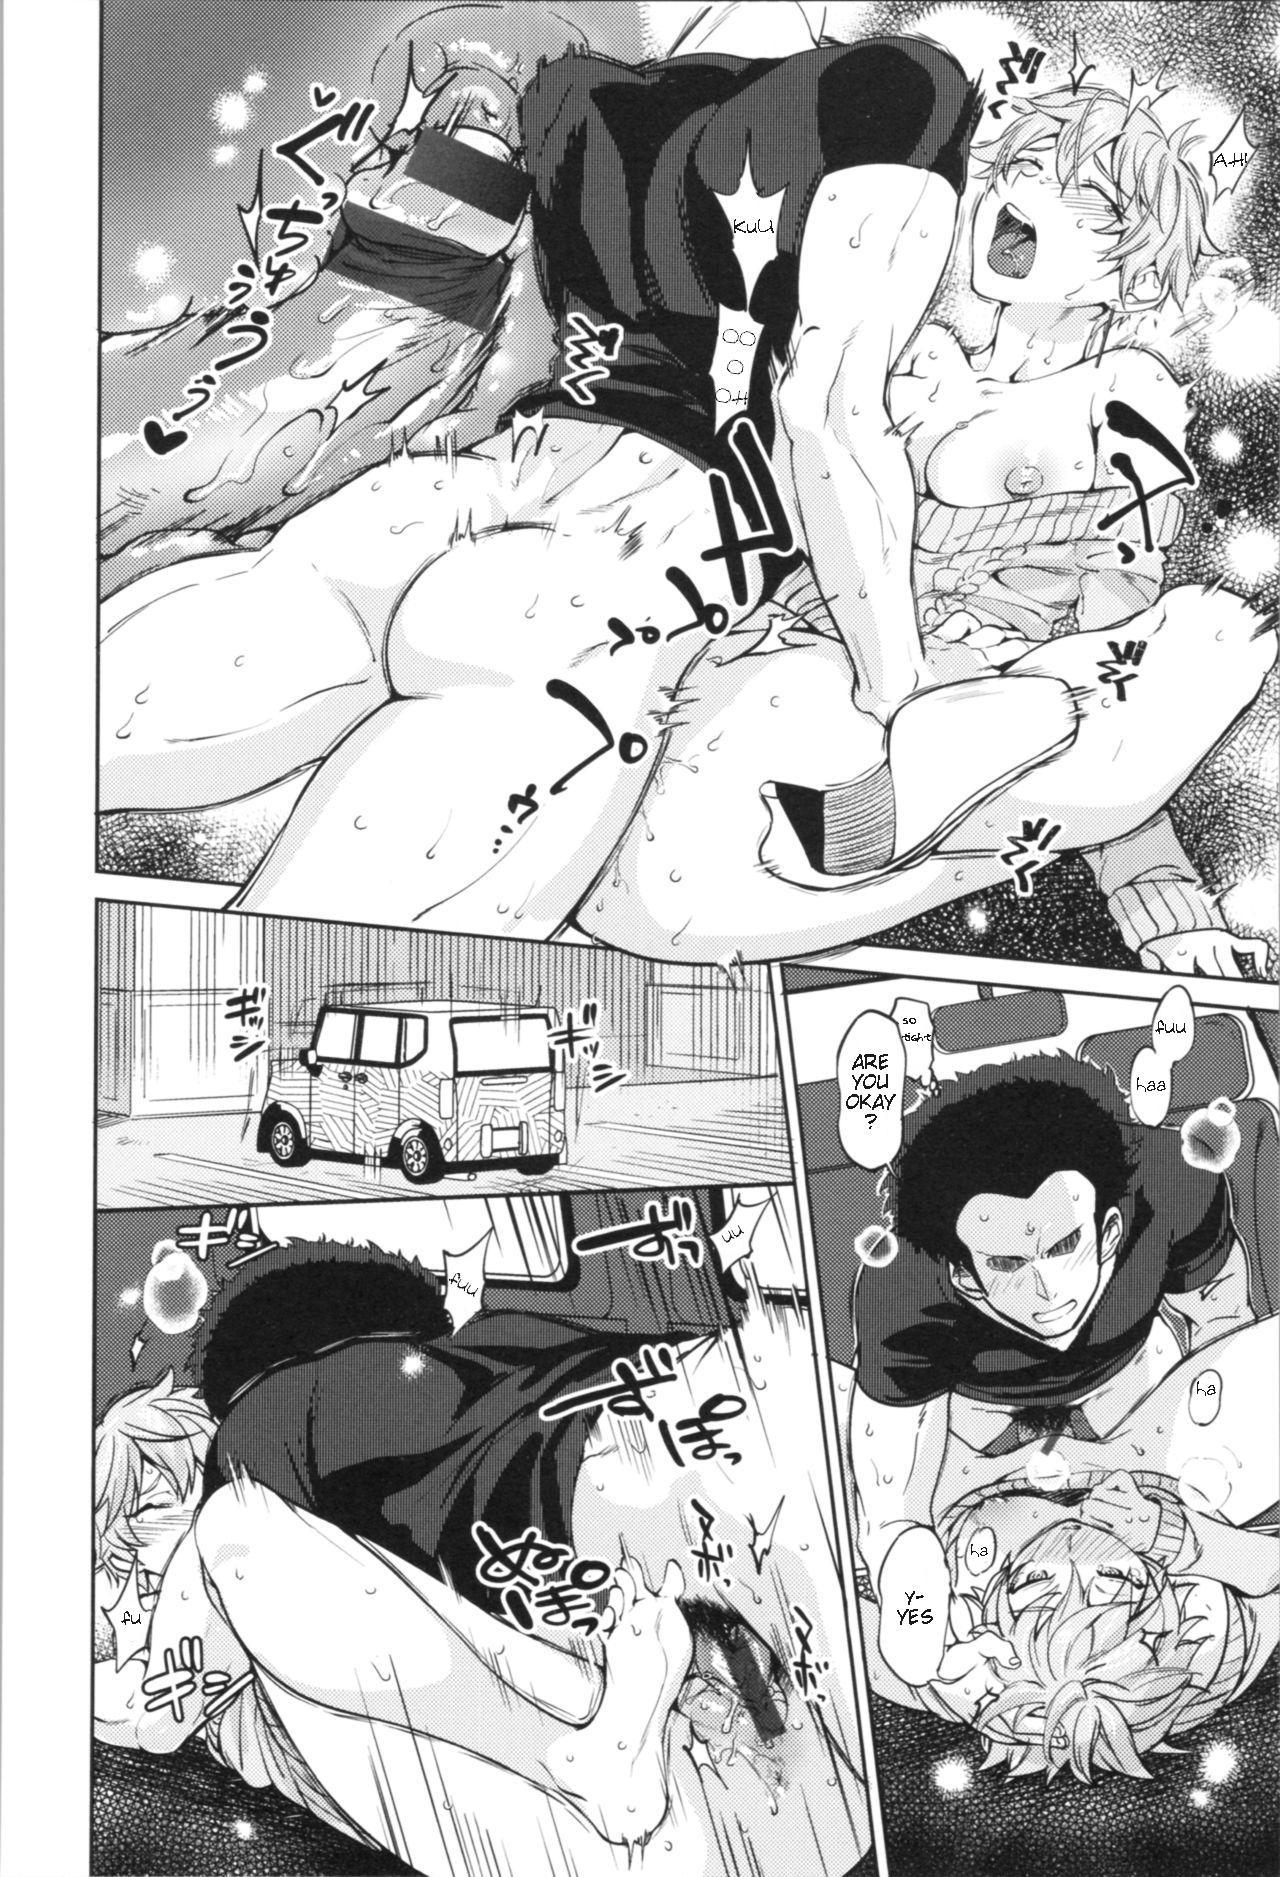 Ouji no Tamago wa Hina ni Kaeru | The Prince's Egg is Hatching 10